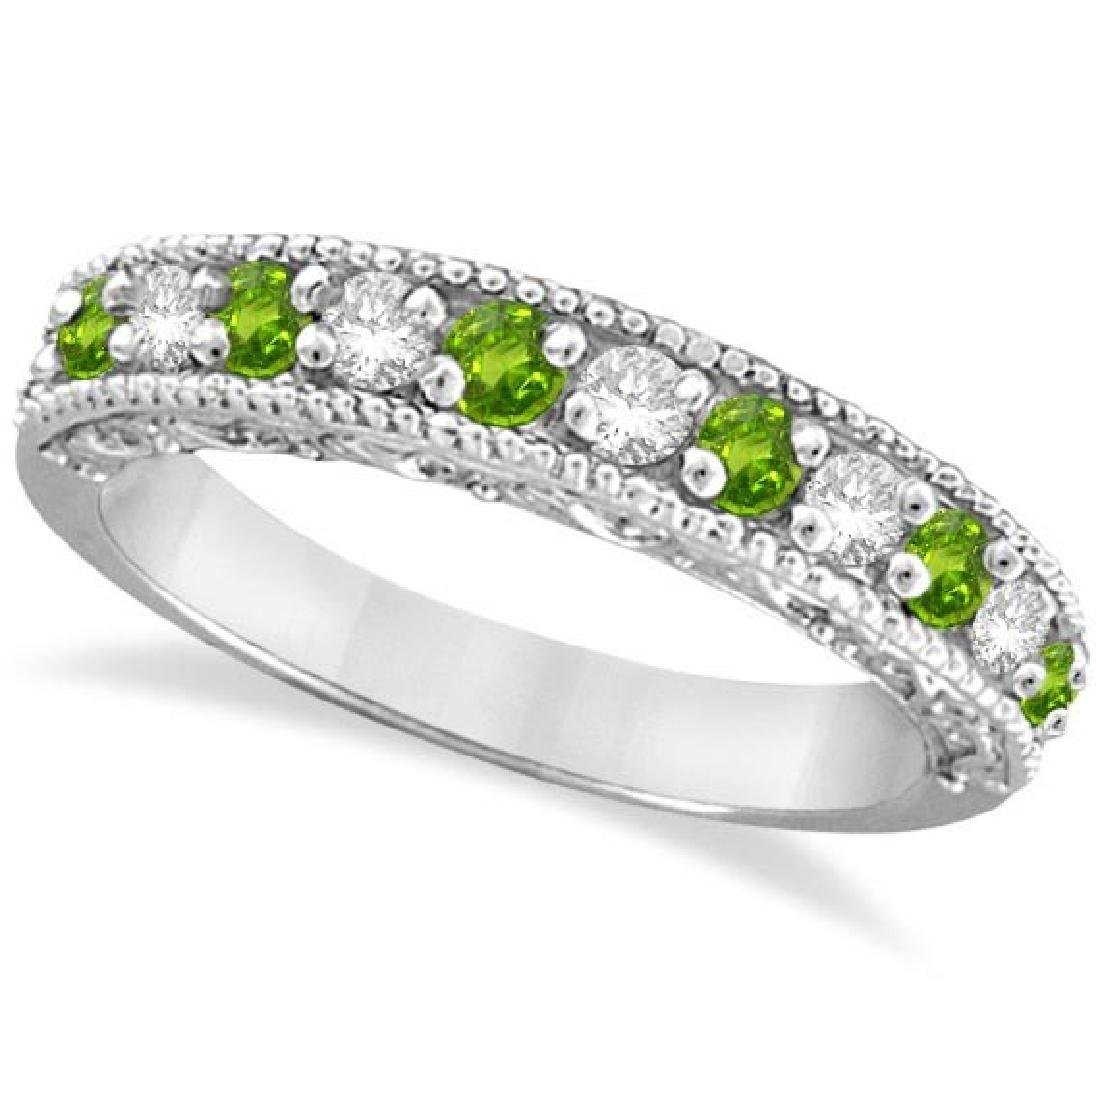 Diamond and Peridot Band Filigree Design Ring 14k White